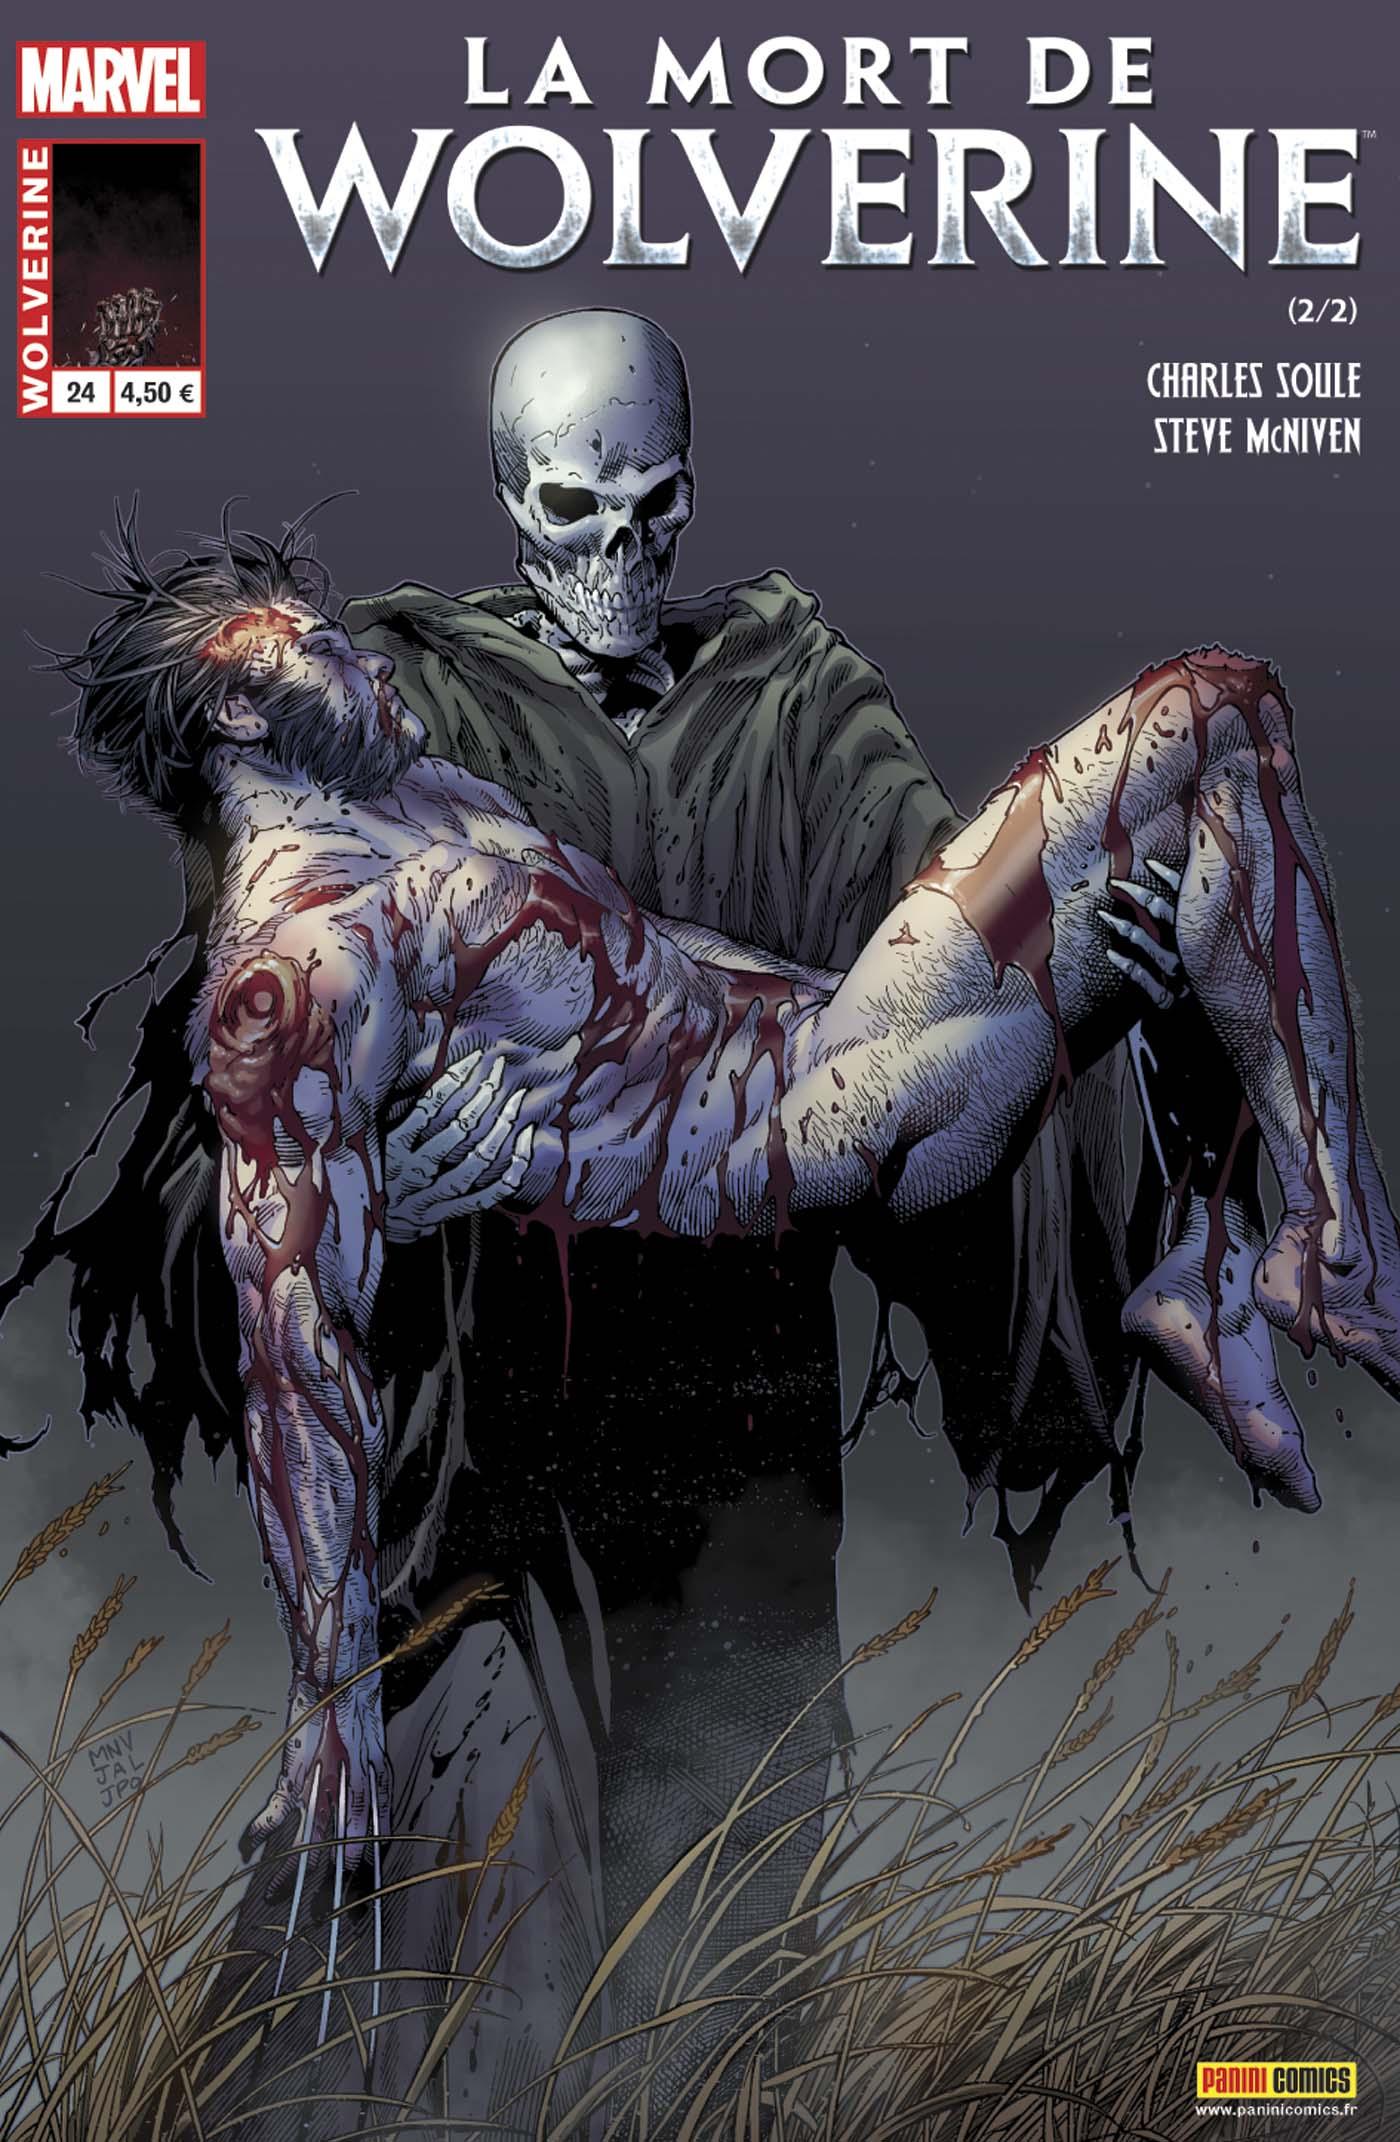 WOLVERINE 24 : LA MORT DE WOLVERINE 2 (sur 2)